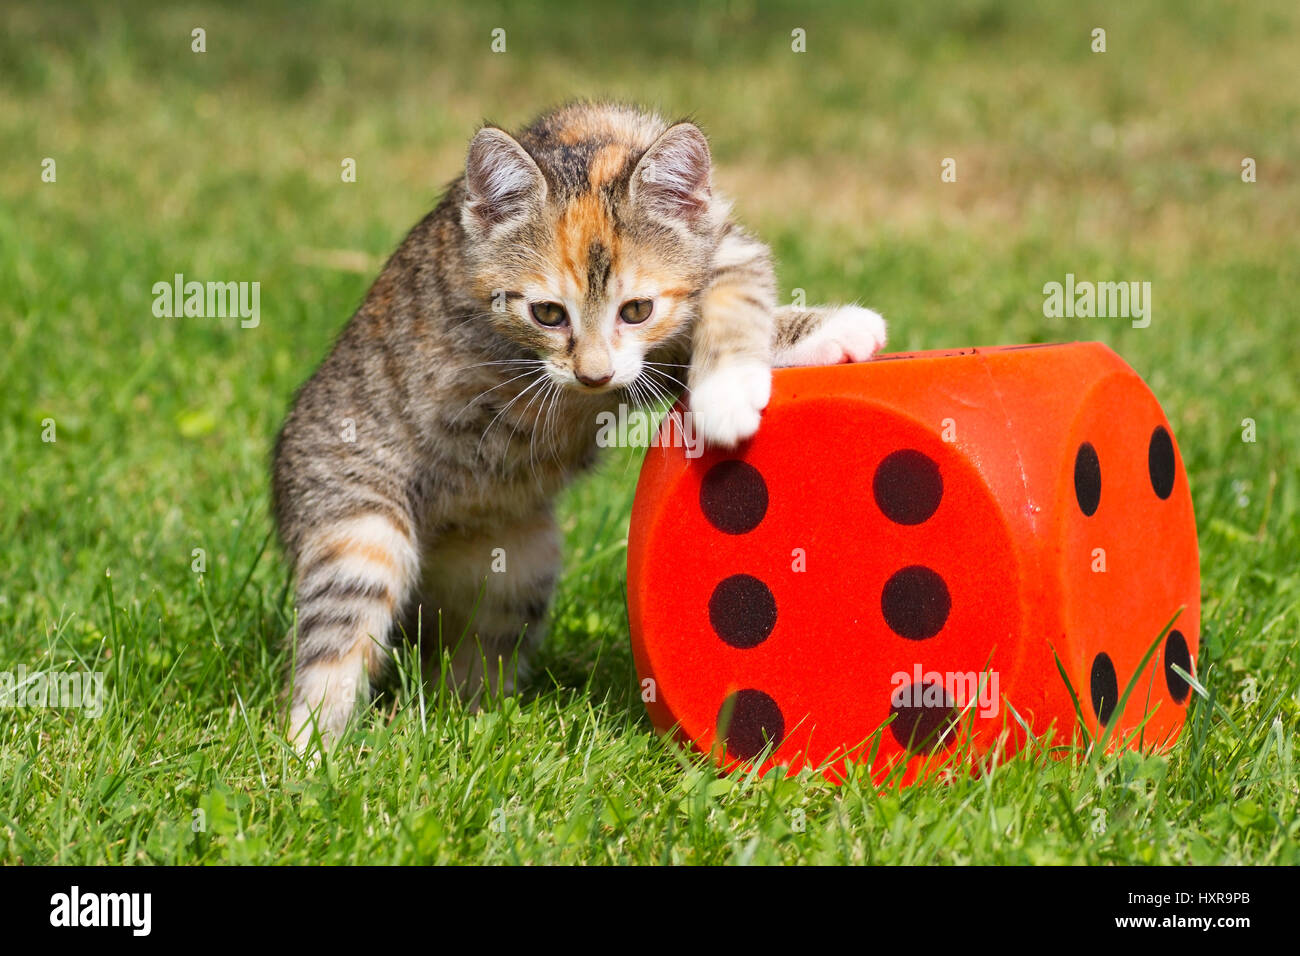 Cat plays, Katze spielt - Stock Image